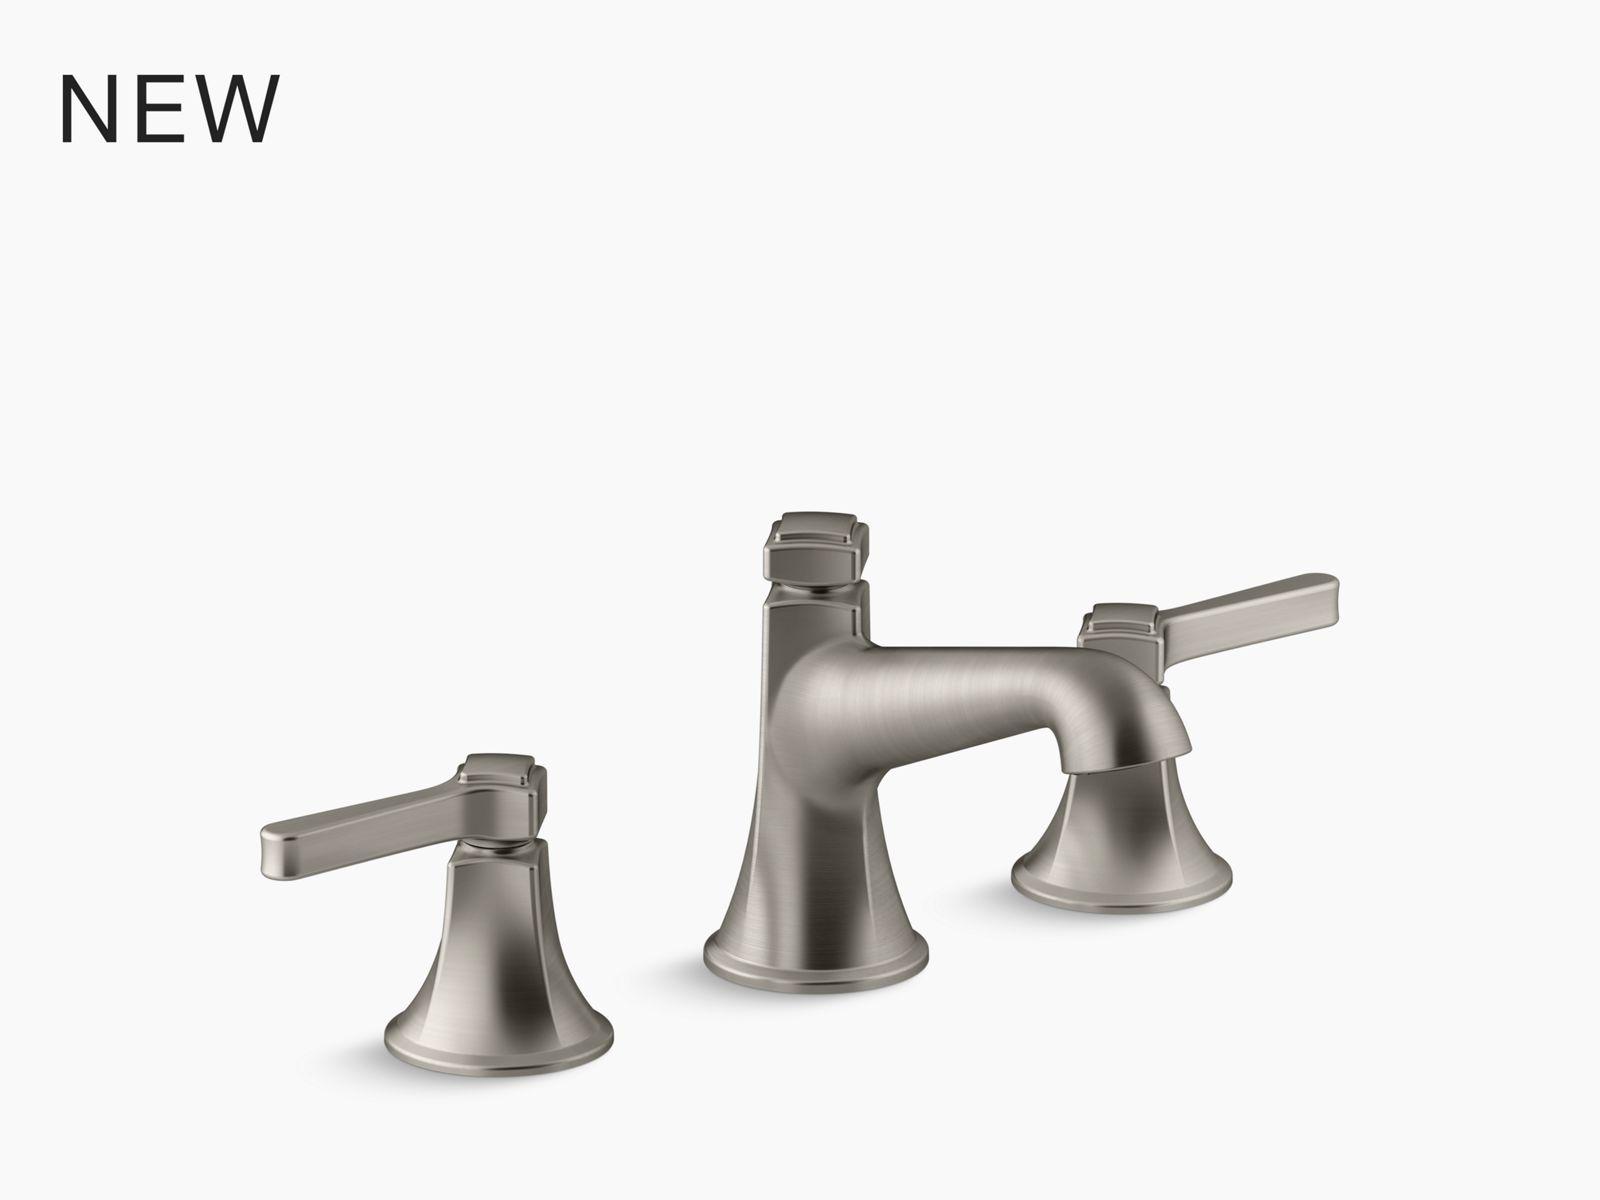 stillness shower handle trim with diverter valve bath spout and shower head not included